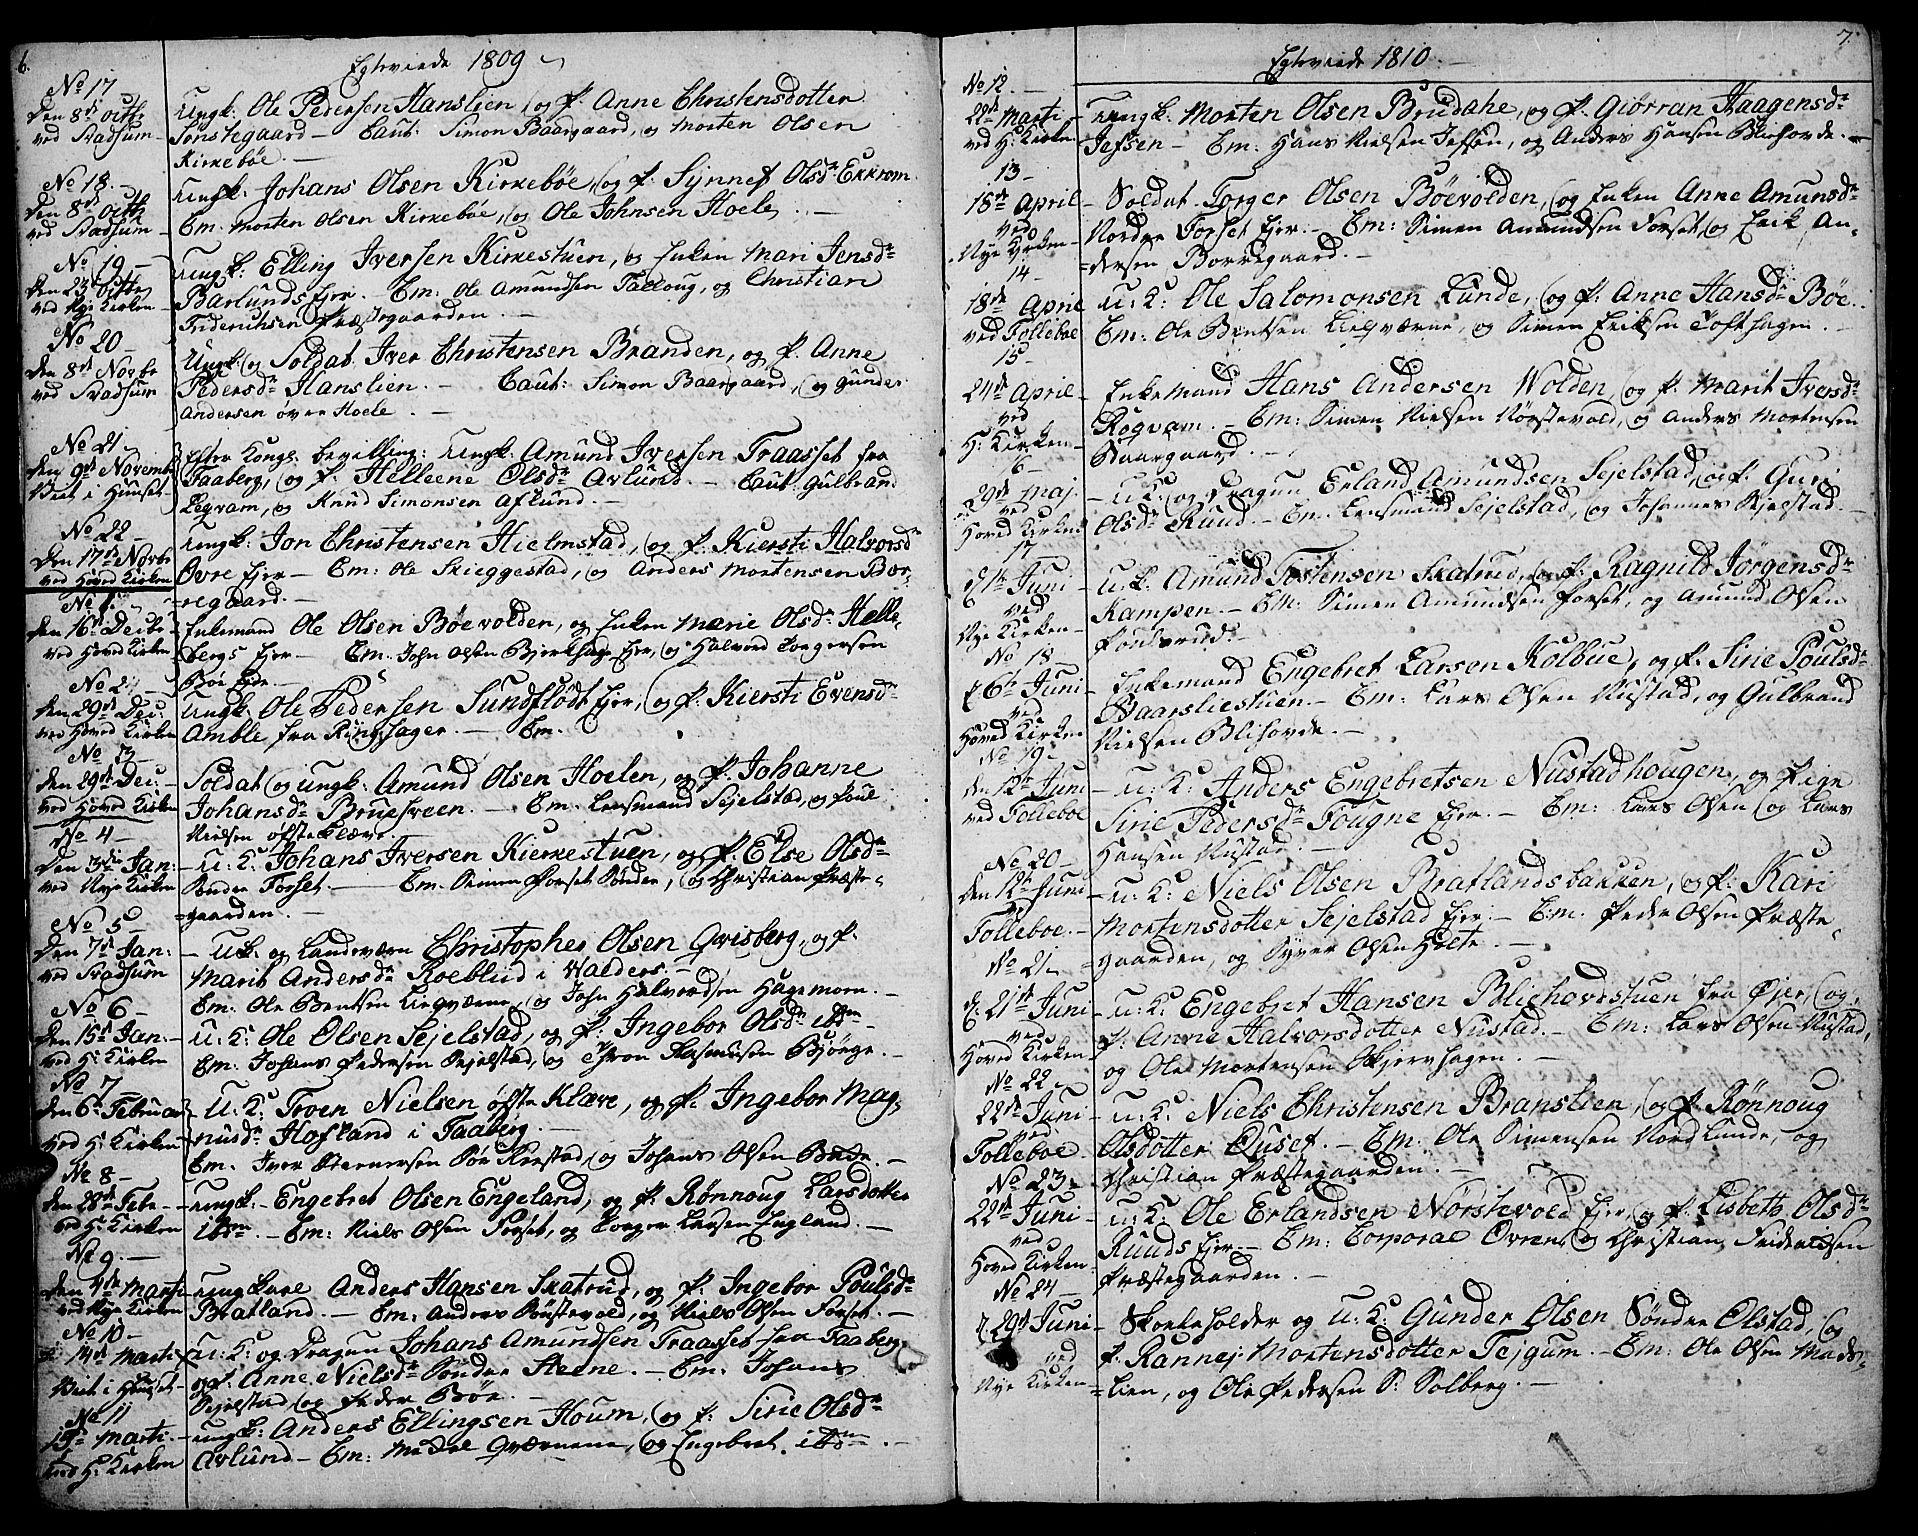 SAH, Gausdal prestekontor, Ministerialbok nr. 4, 1809-1817, s. 6-7